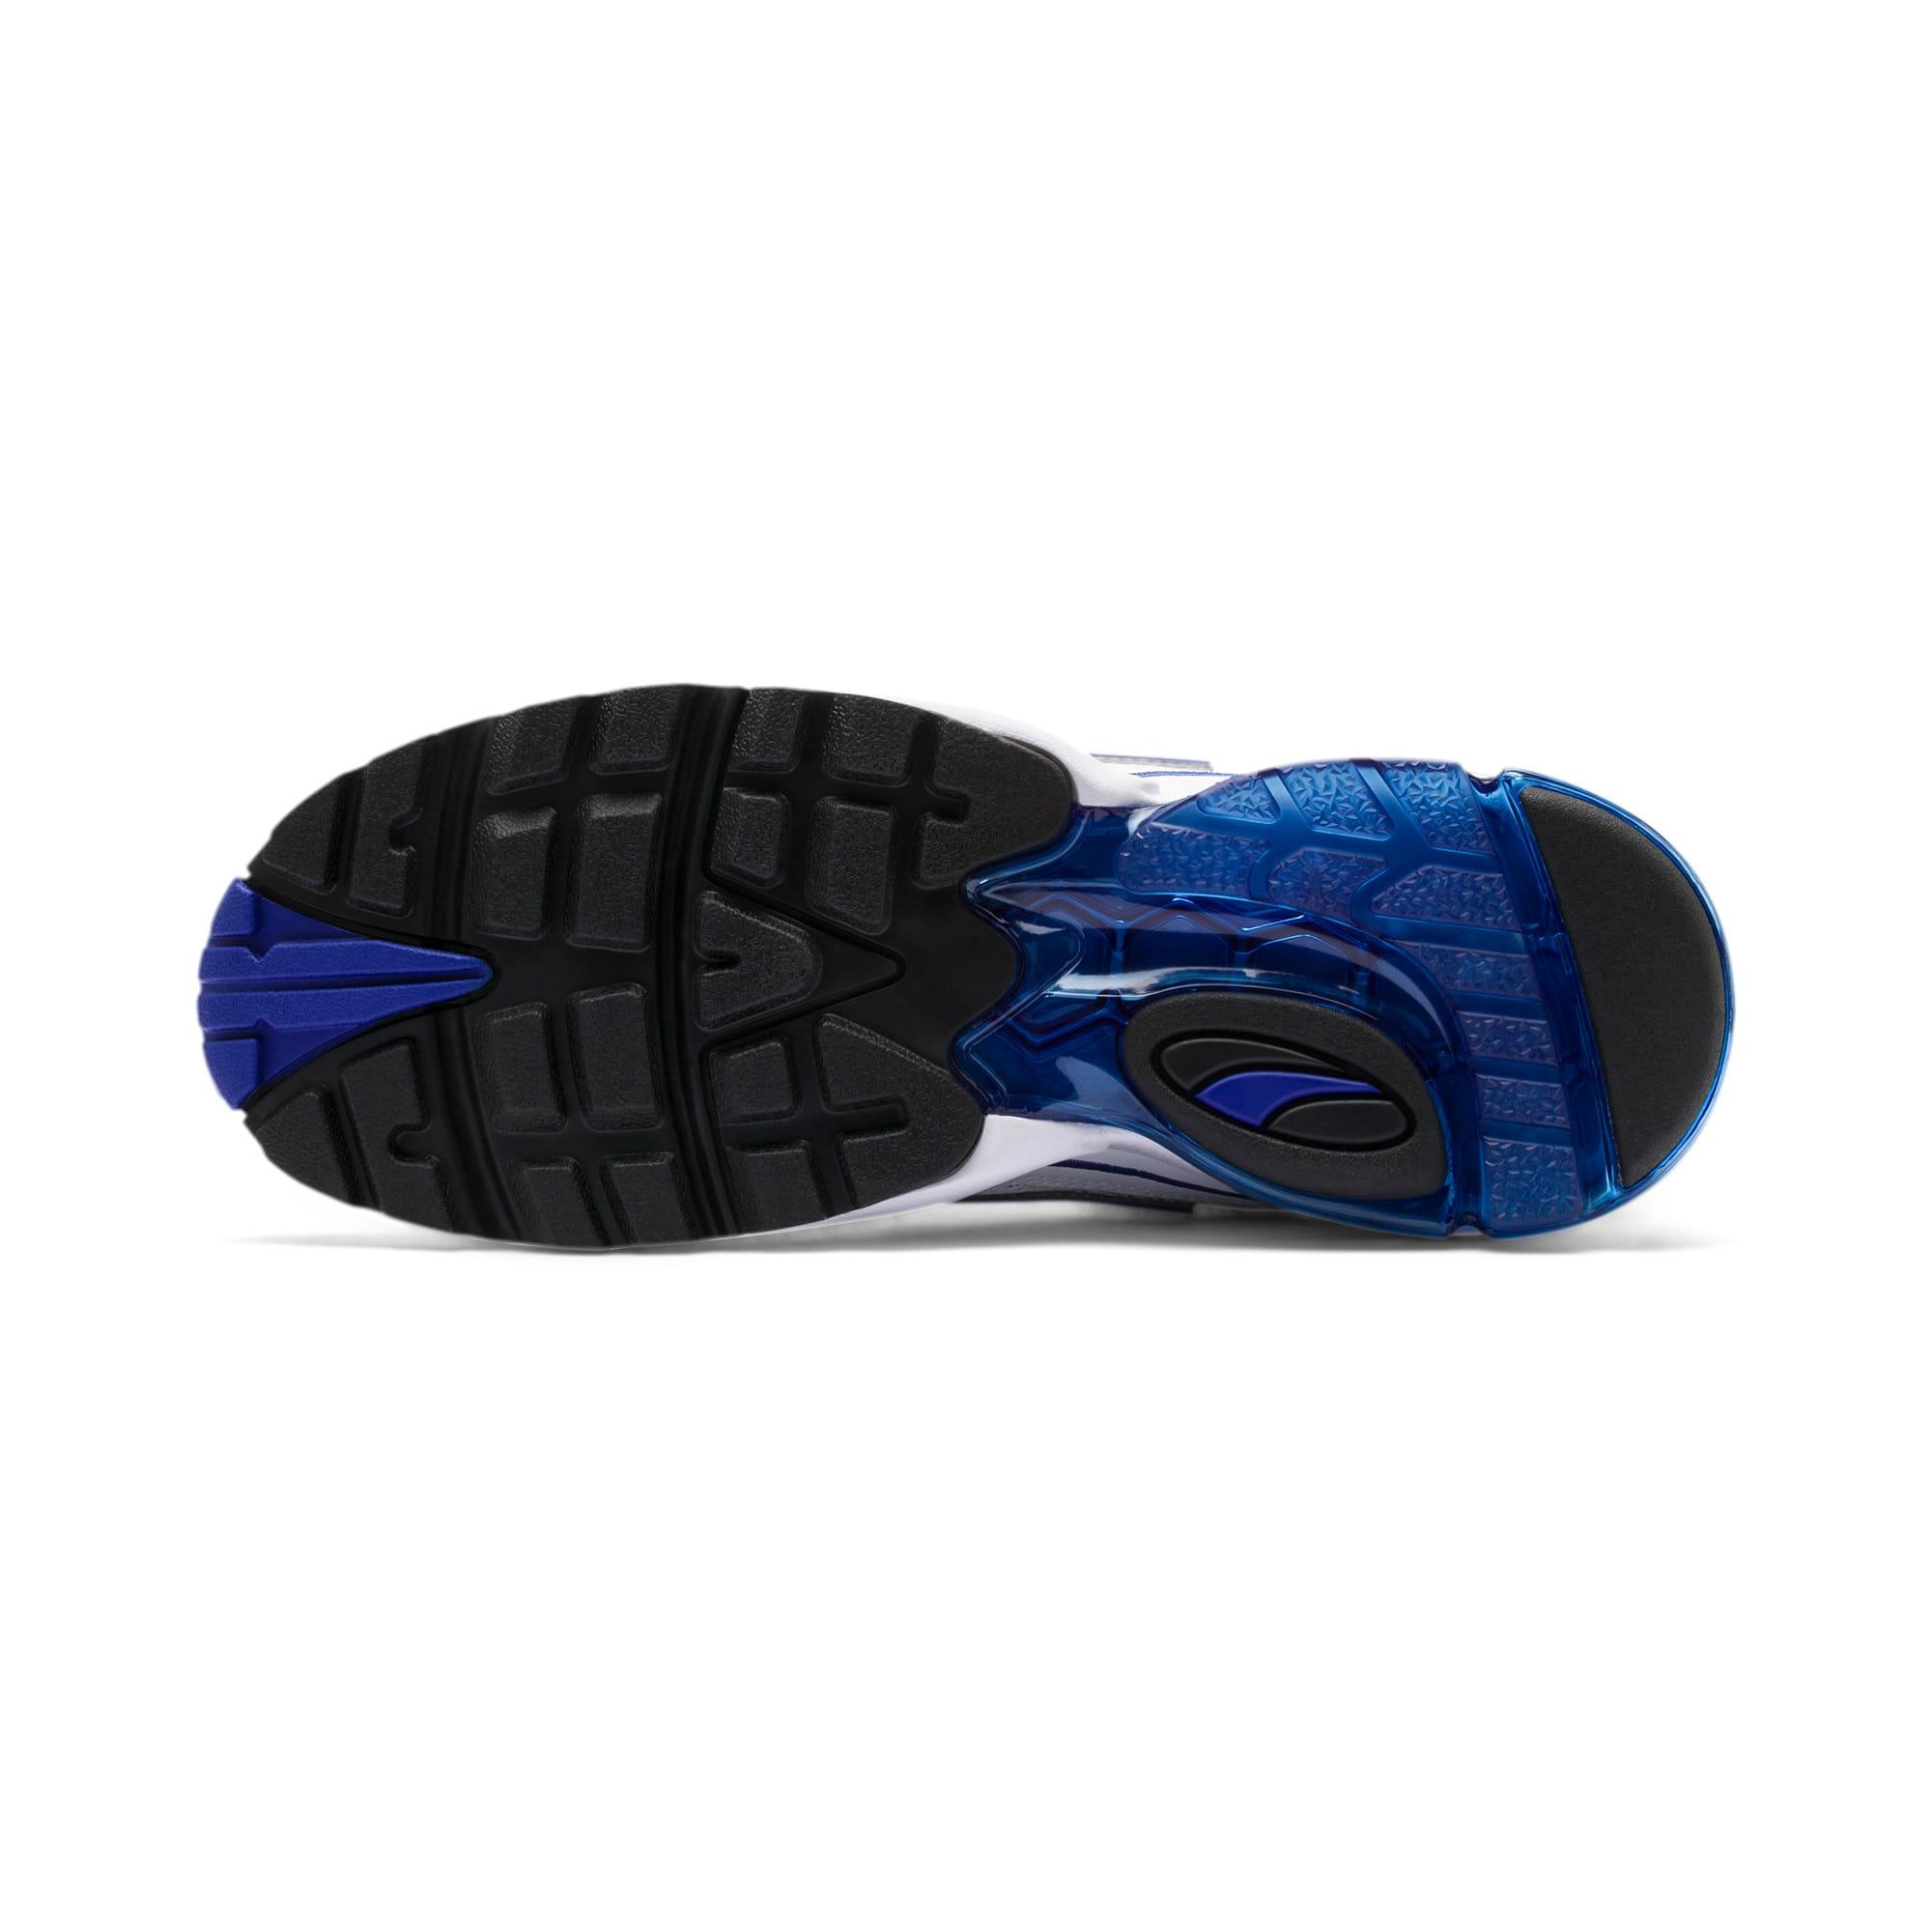 Thumbnail 5 of CELL Ultra OG Pack Sneakers, Puma White-Teal Green, medium